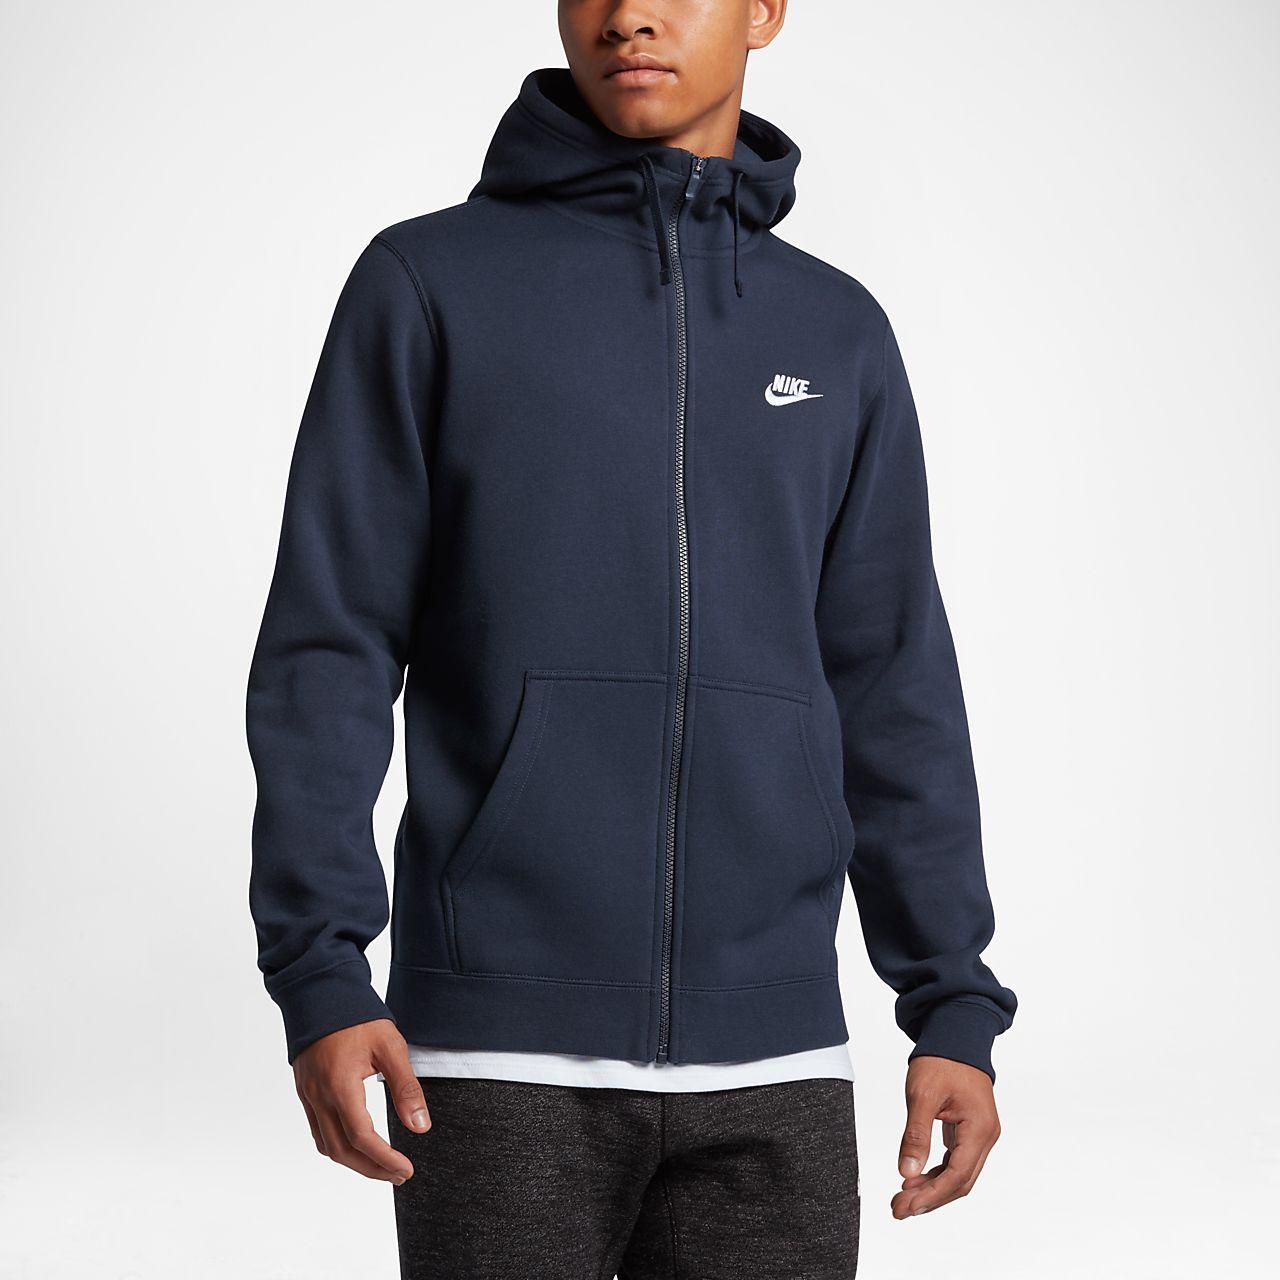 8b99813013 Nike Sportswear Full-Zip Men s Hoodie. Nike.com